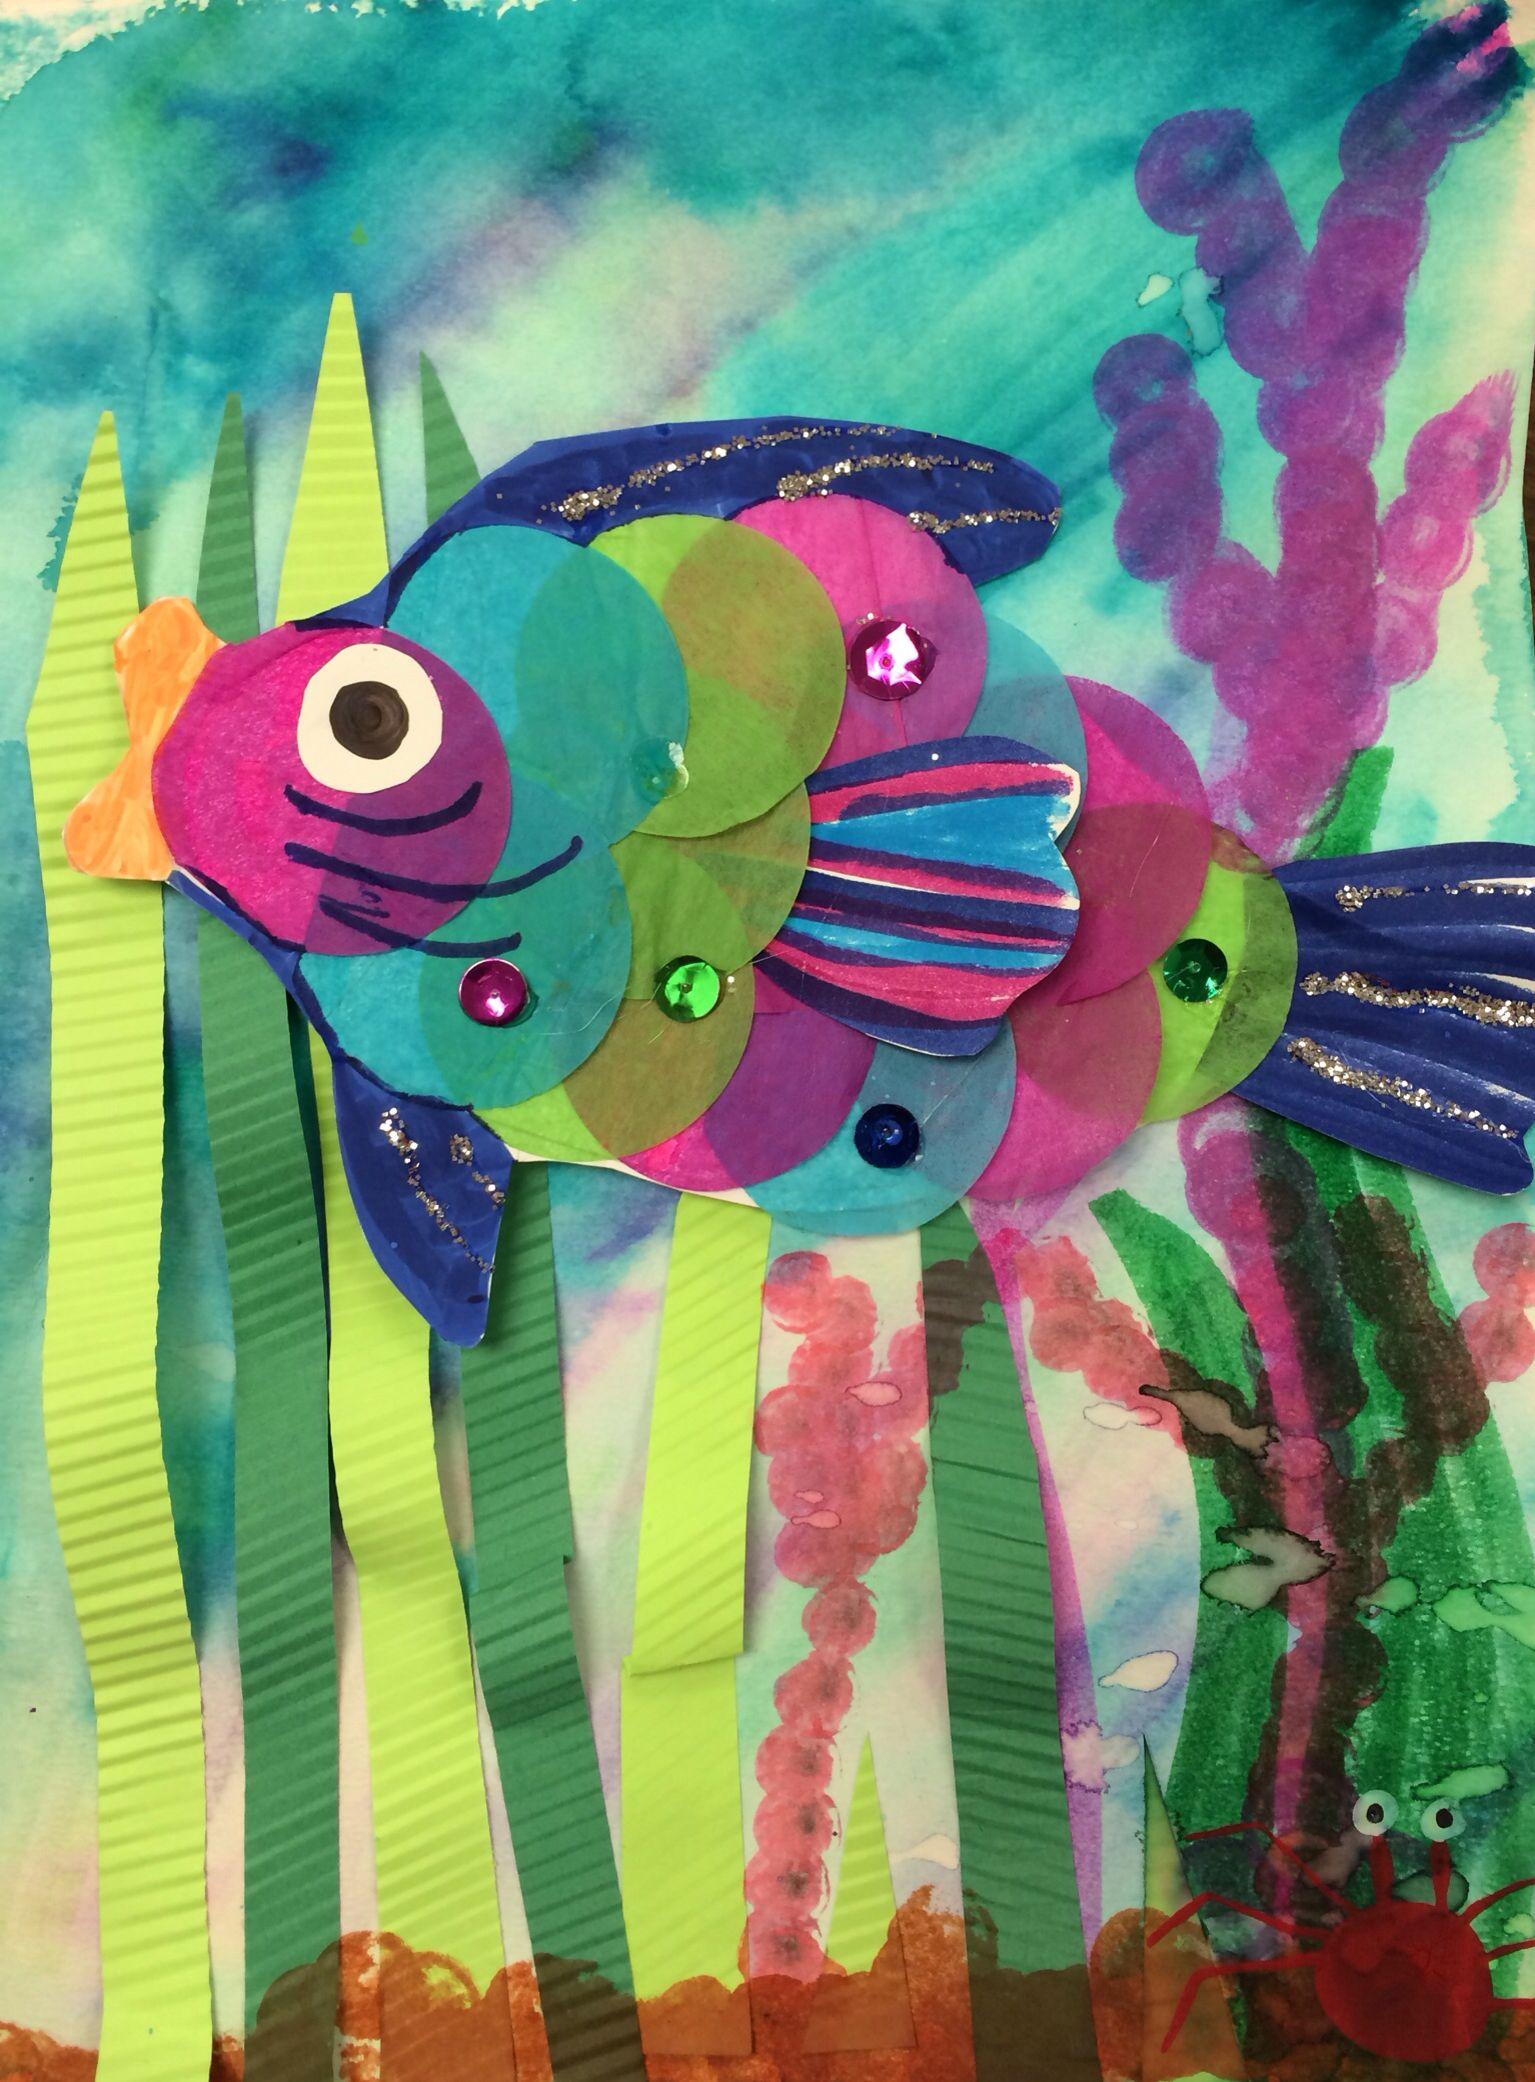 Rainbow fish project | 4th grade art projects | Pinterest | Rainbow ...